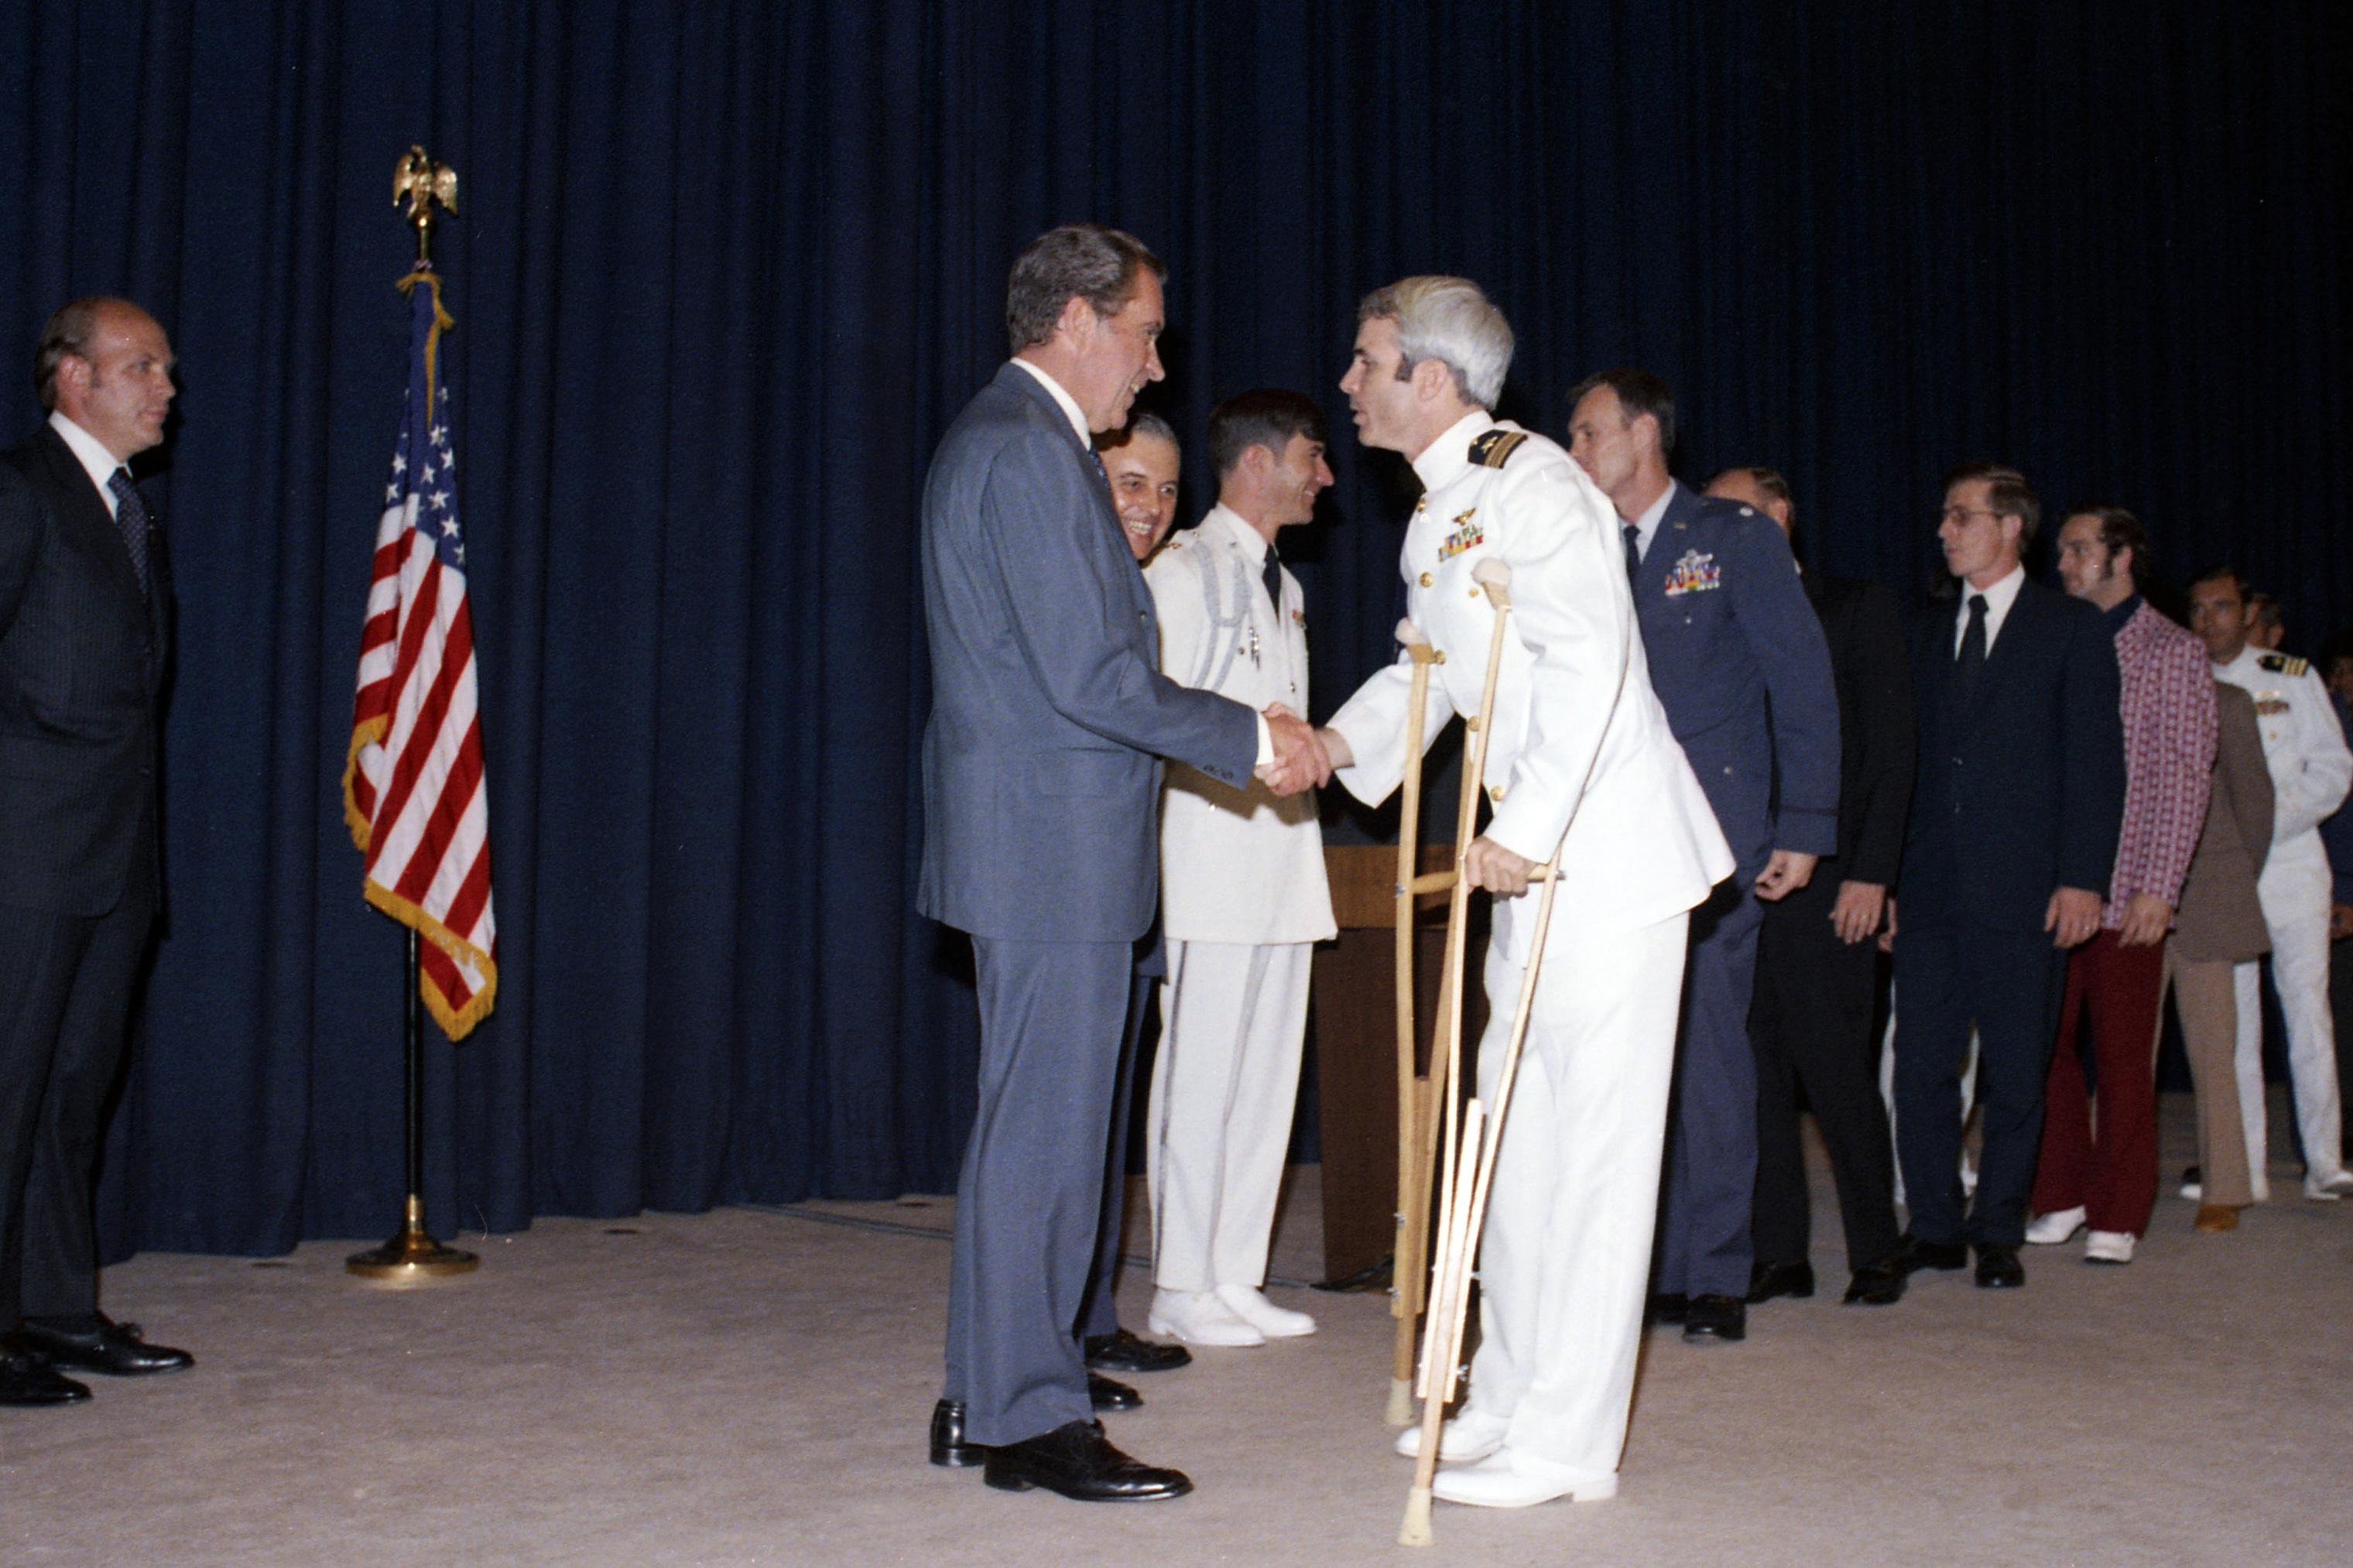 At a pre-dinner reception, US President Richard Nixon (1913 - 1994) greets former North Vietnamese prisoner of war Lieutenant Commander John McCain, in Washington DC, on May 24, 1973.